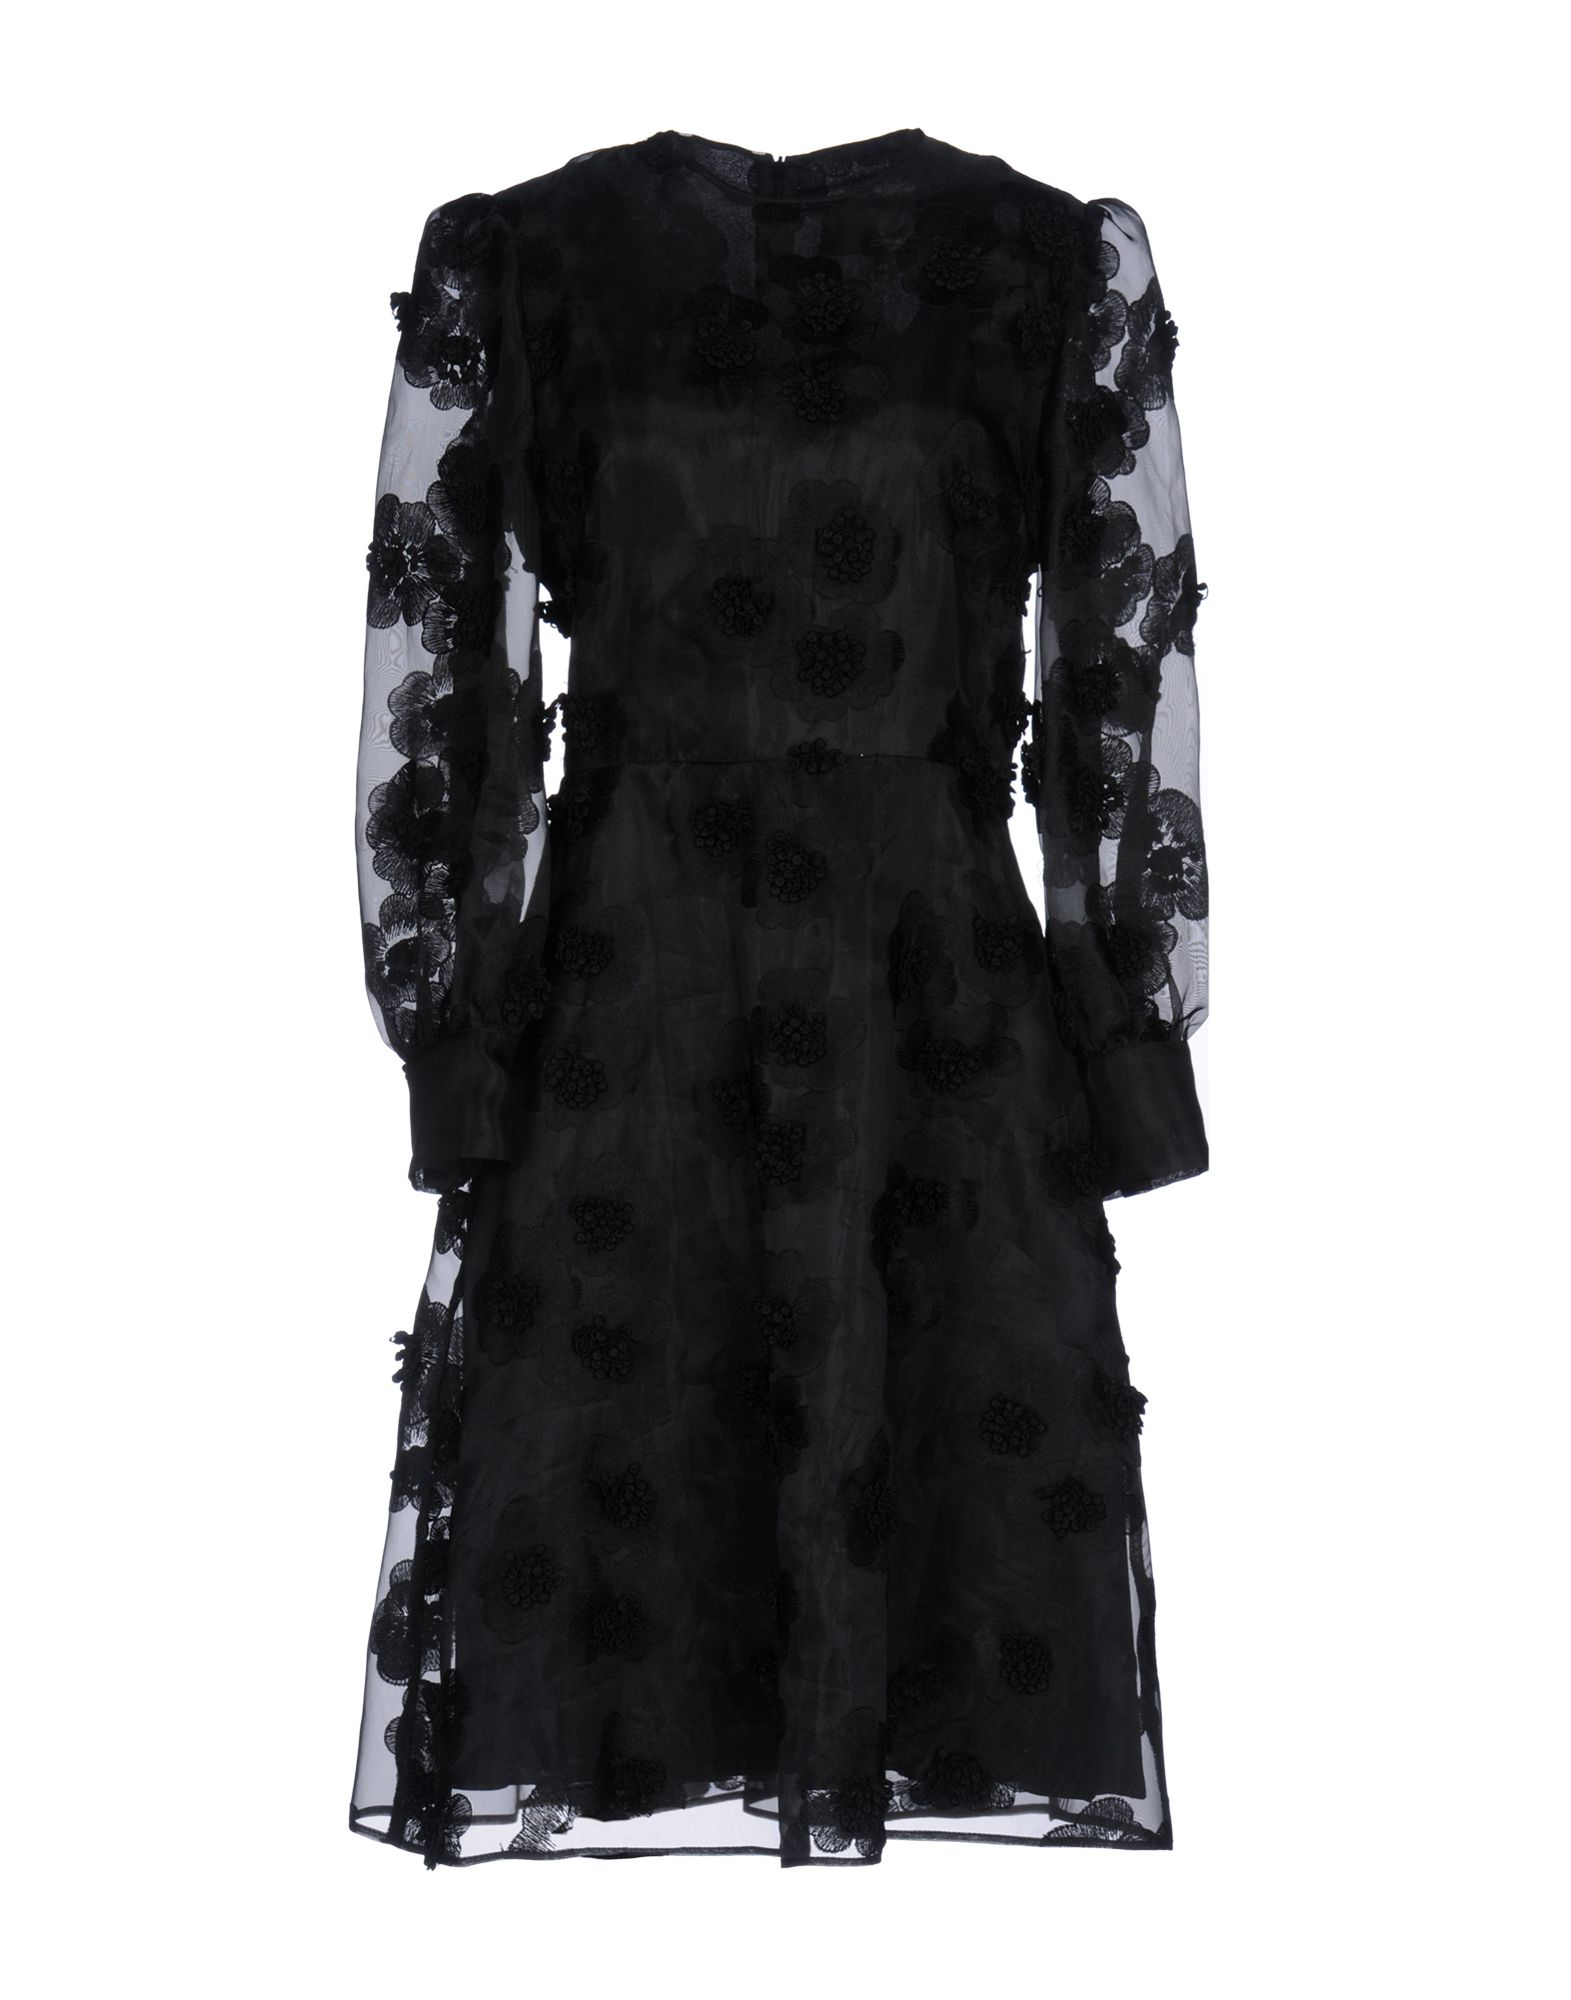 цены на SIMONA CORSELLINI Платье до колена в интернет-магазинах